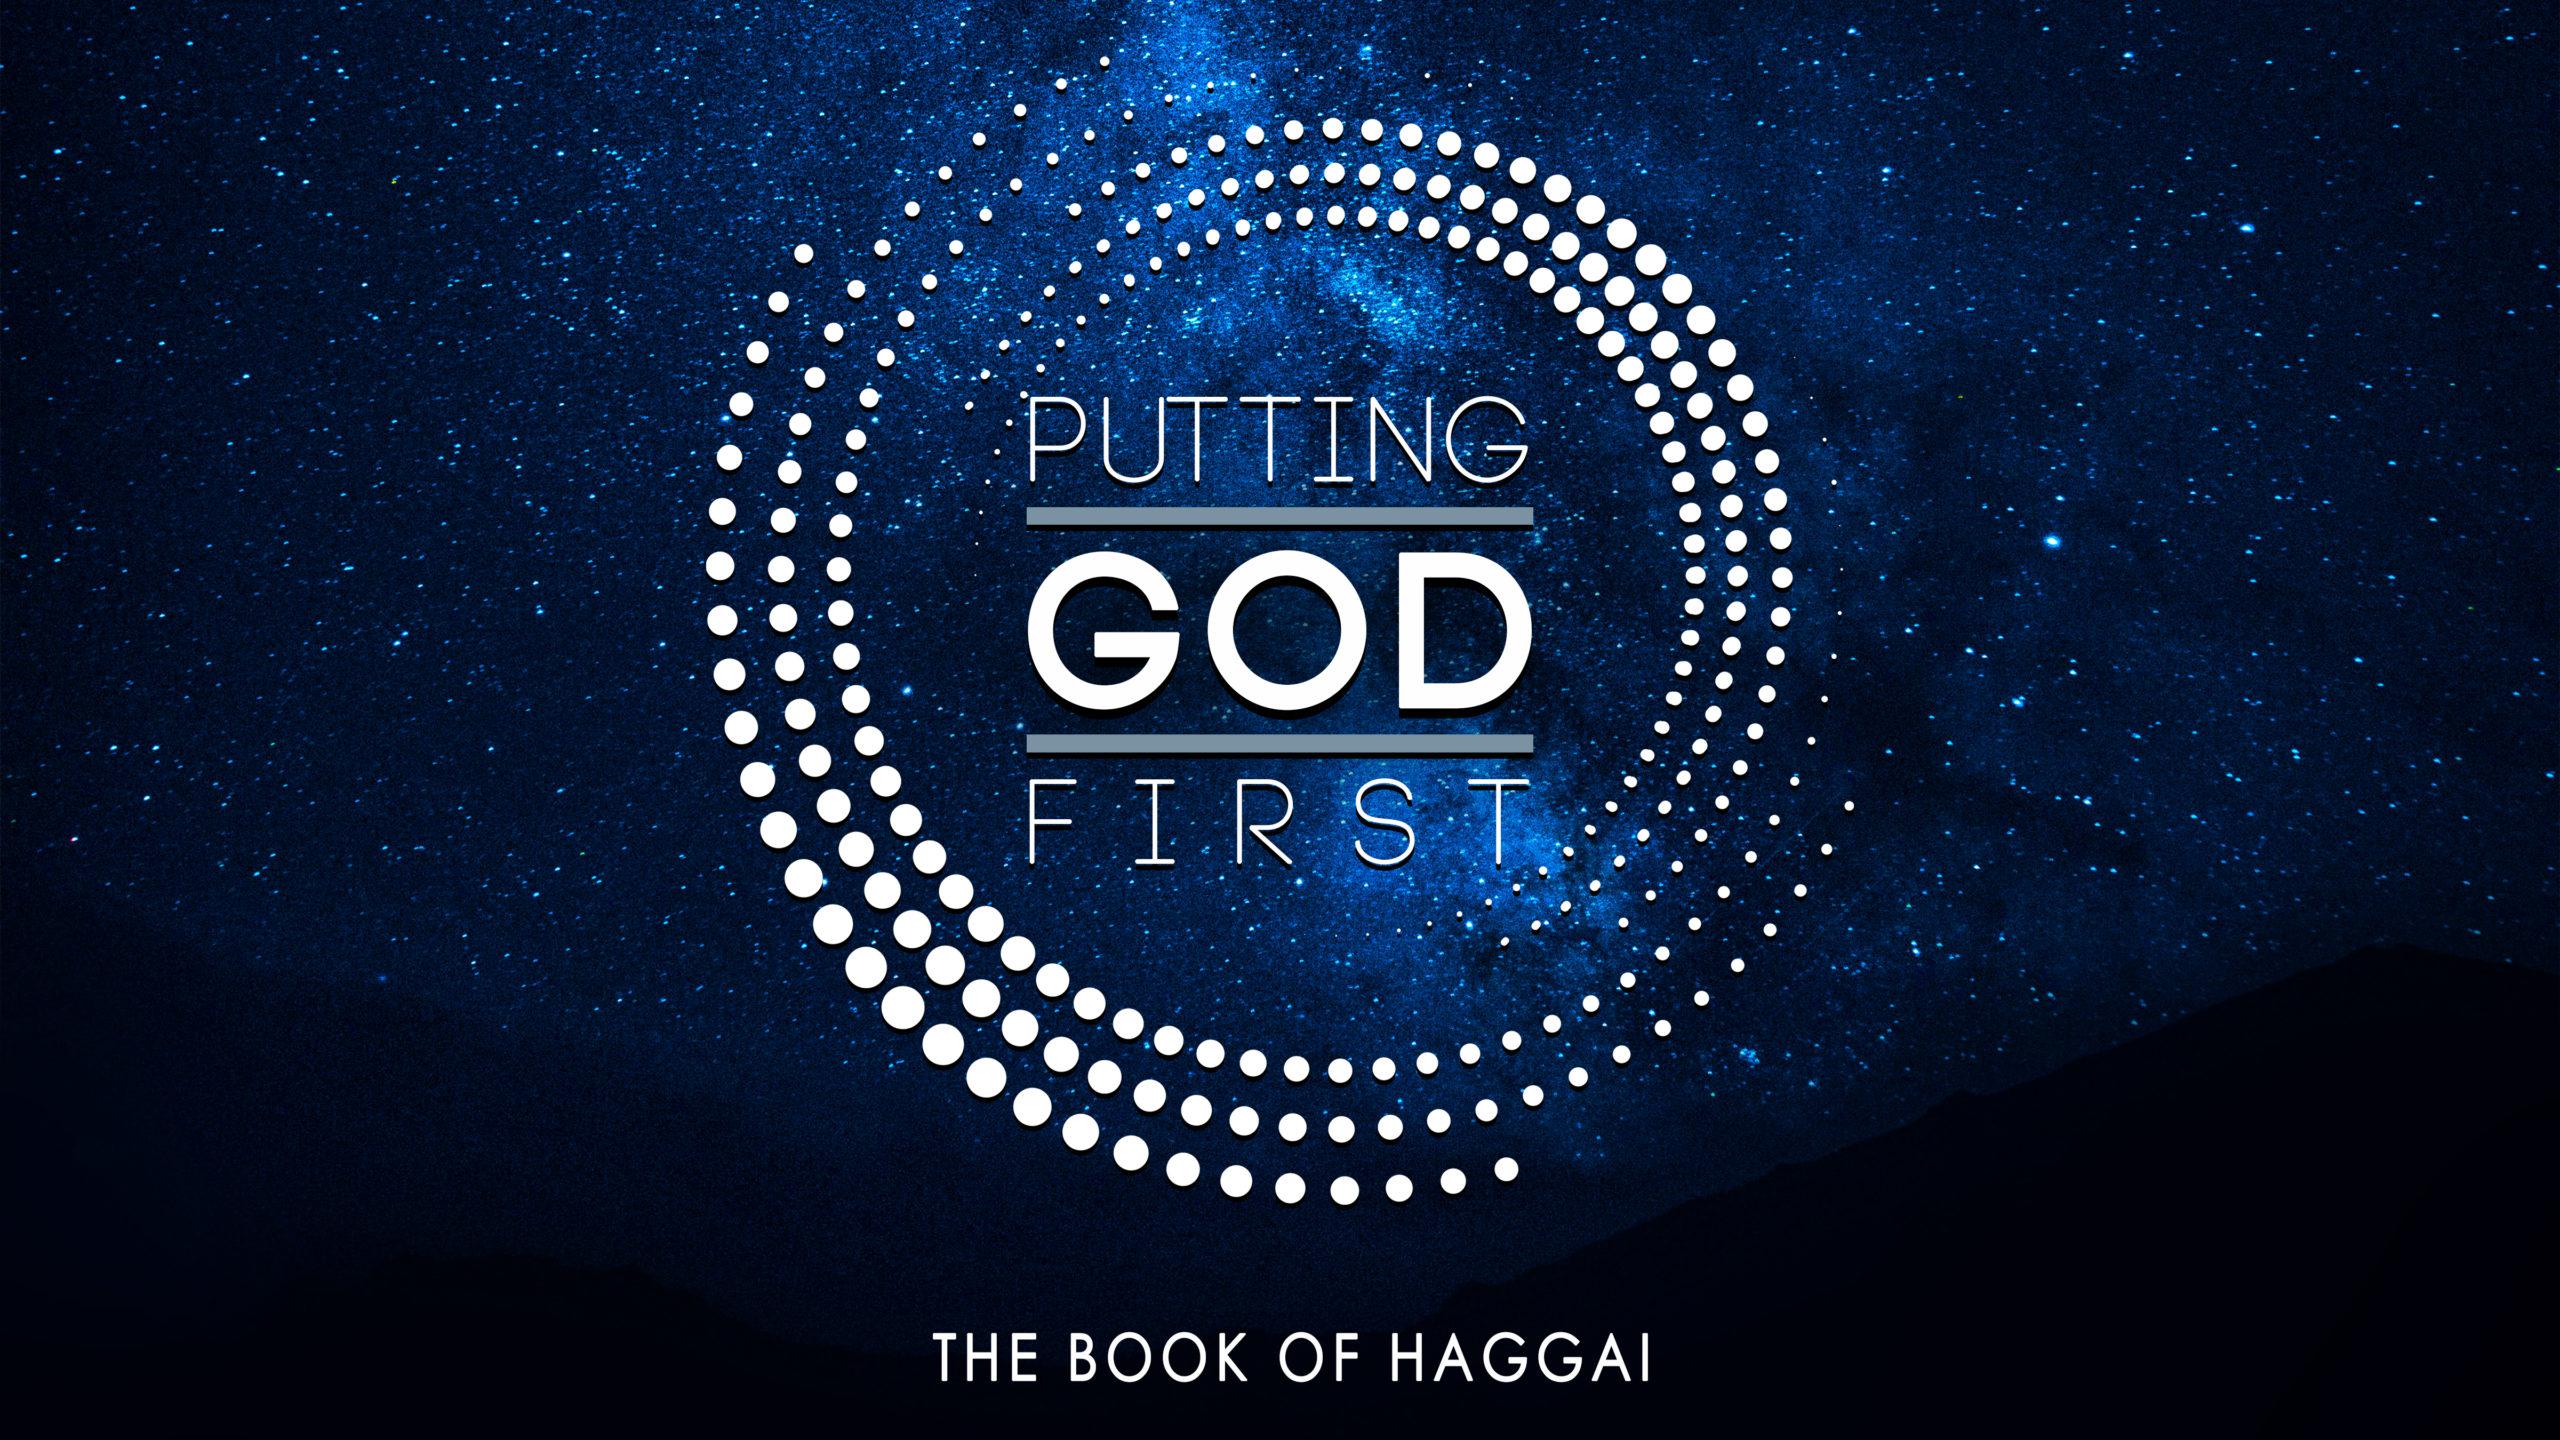 Putting God First Title Art_1 copy